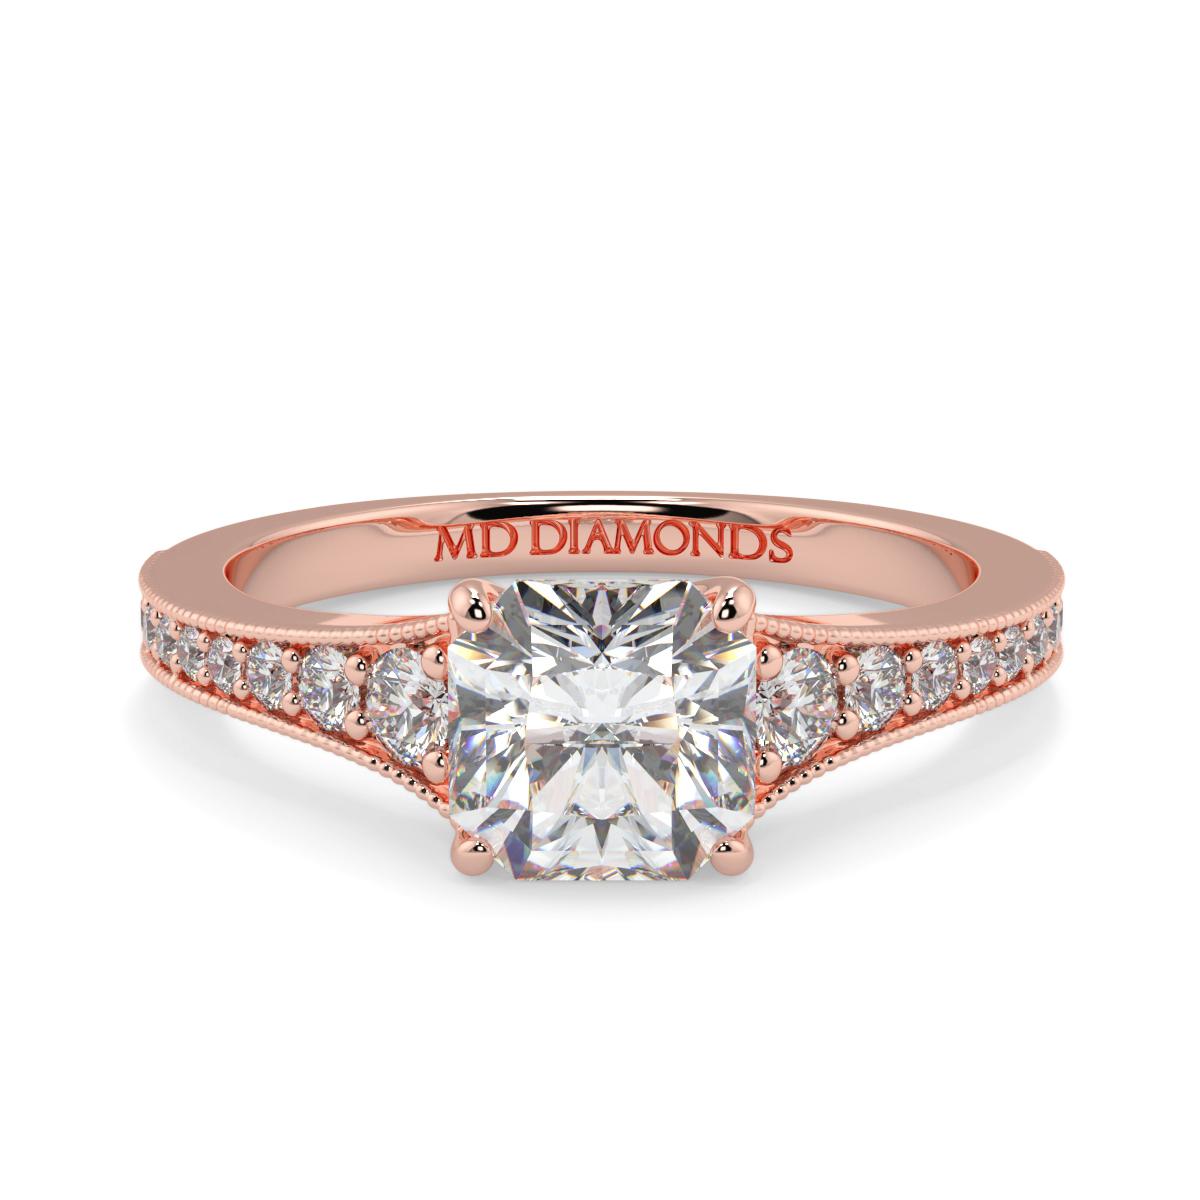 Assher Pave Set Milgrained Diamond Ring